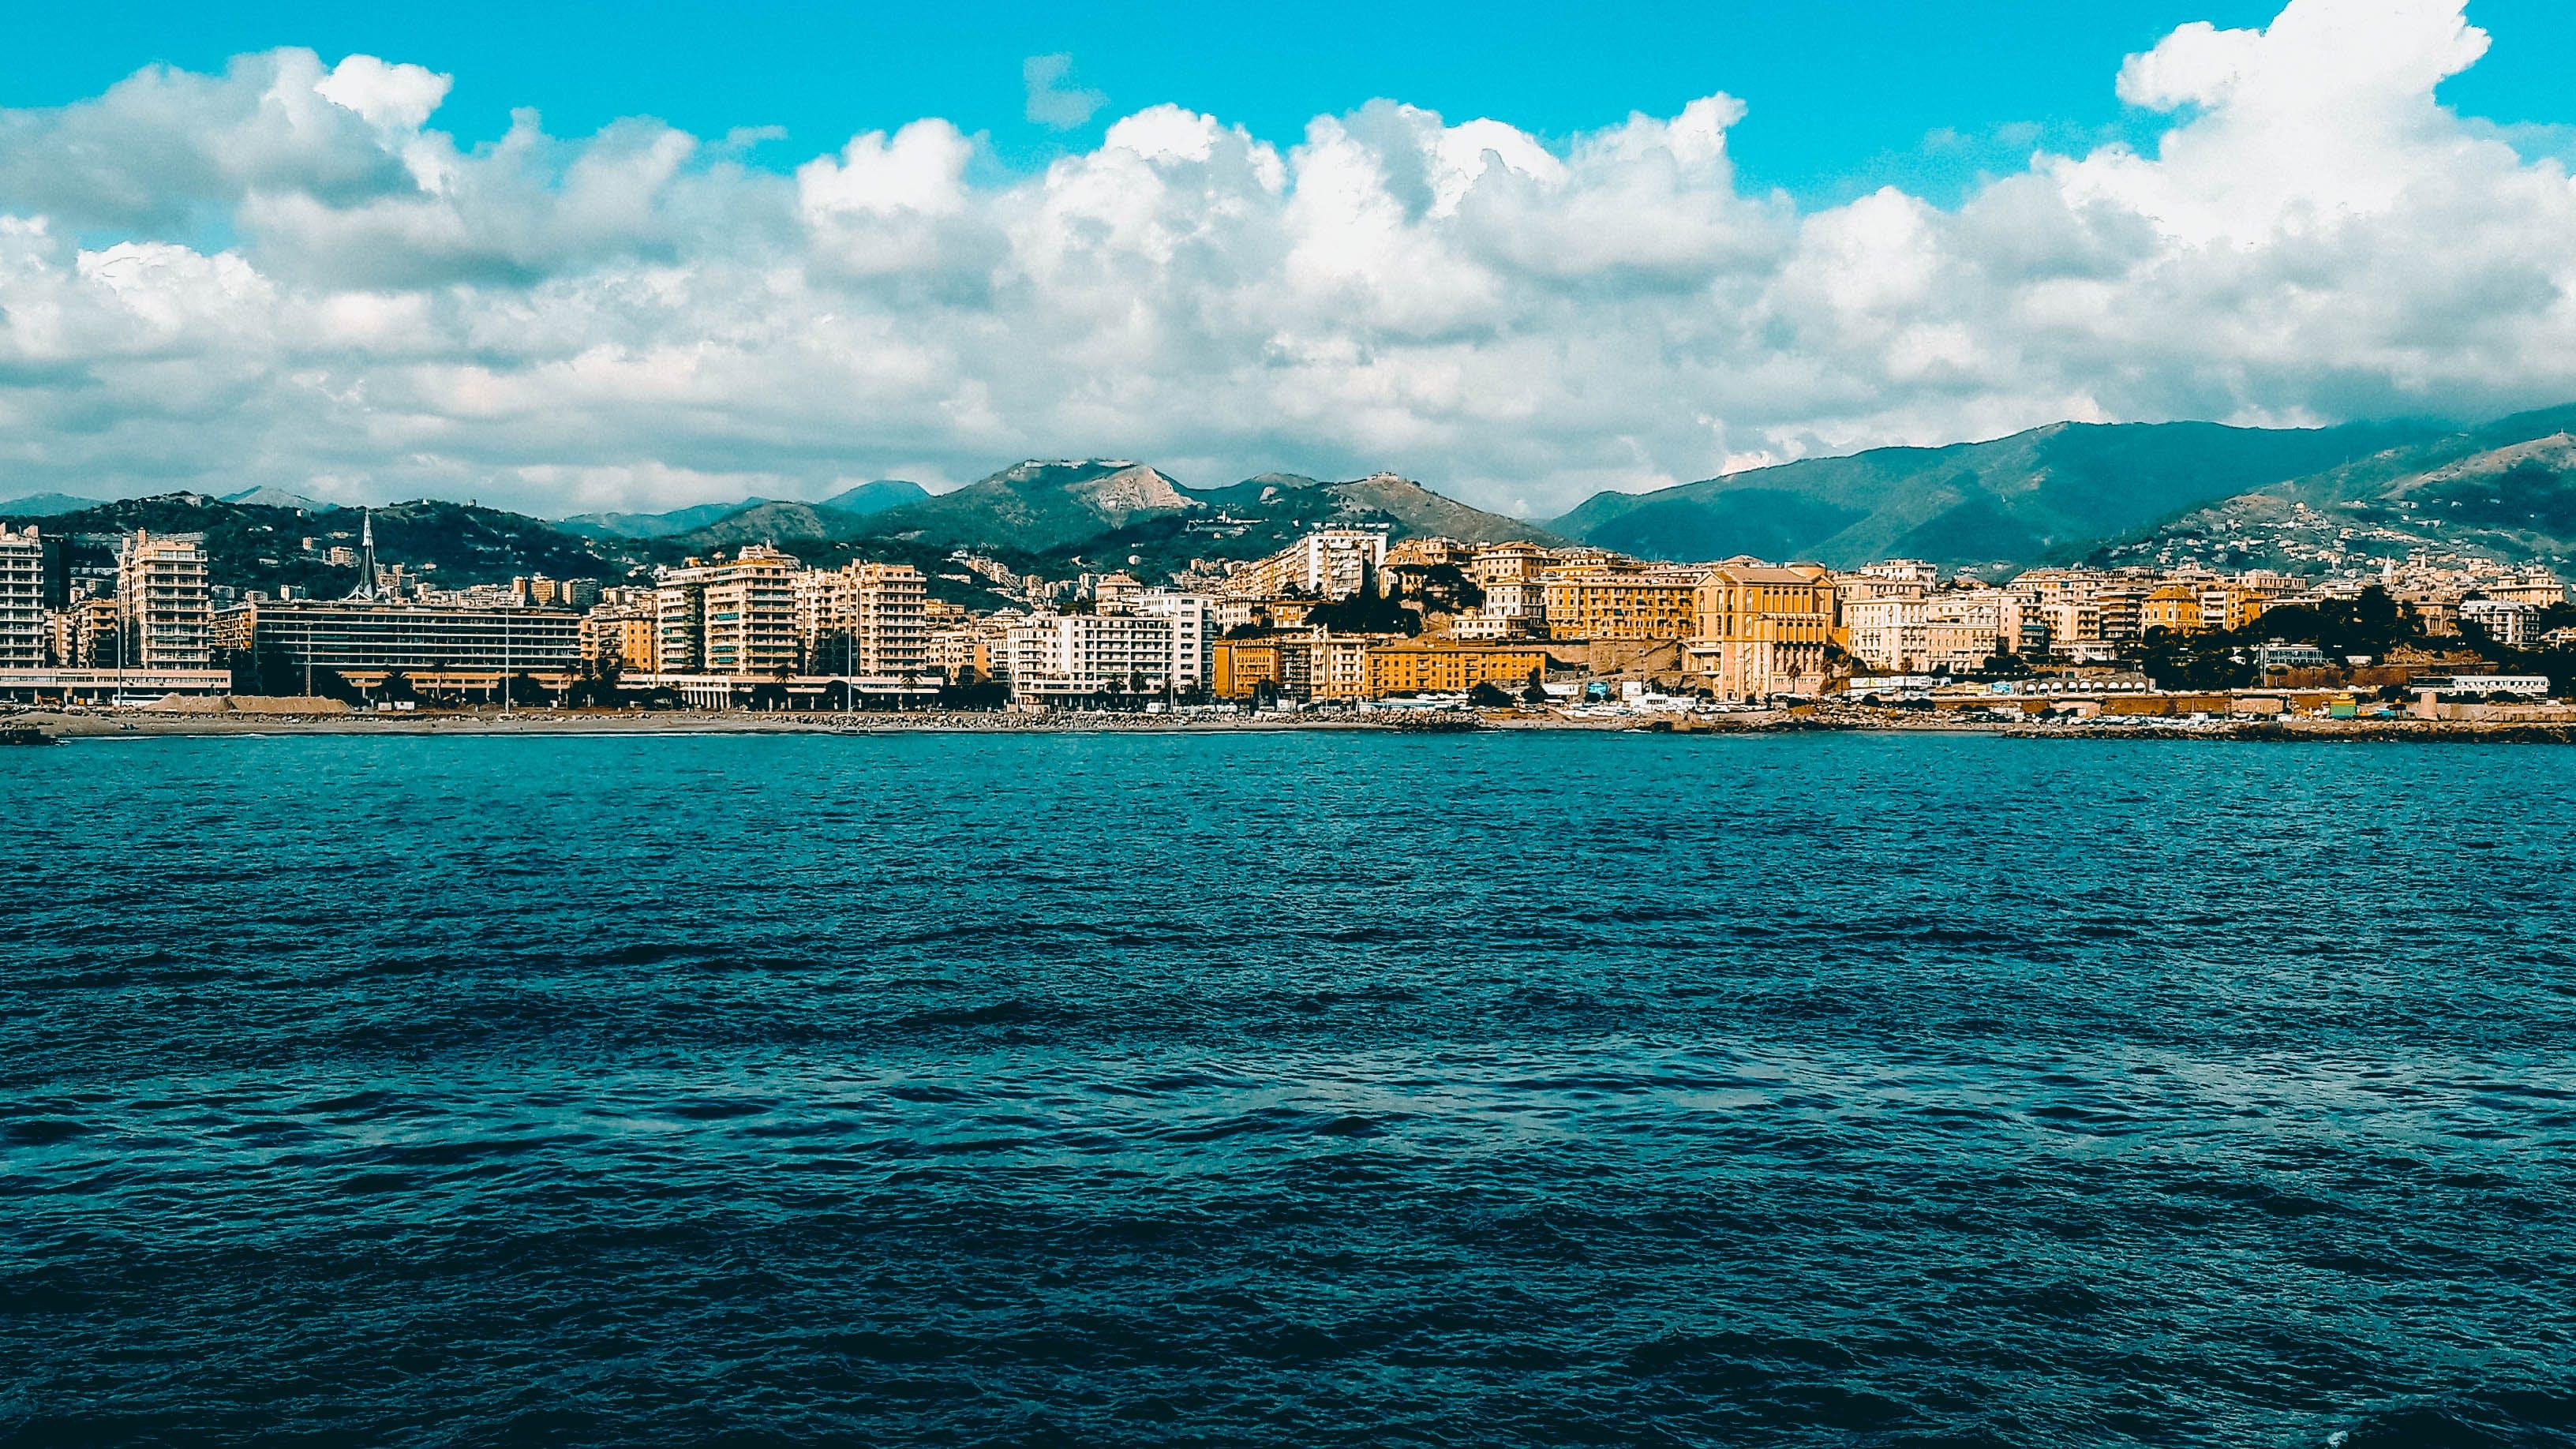 Kostenloses Stock Foto zu blau, corsica, himmel, livorno